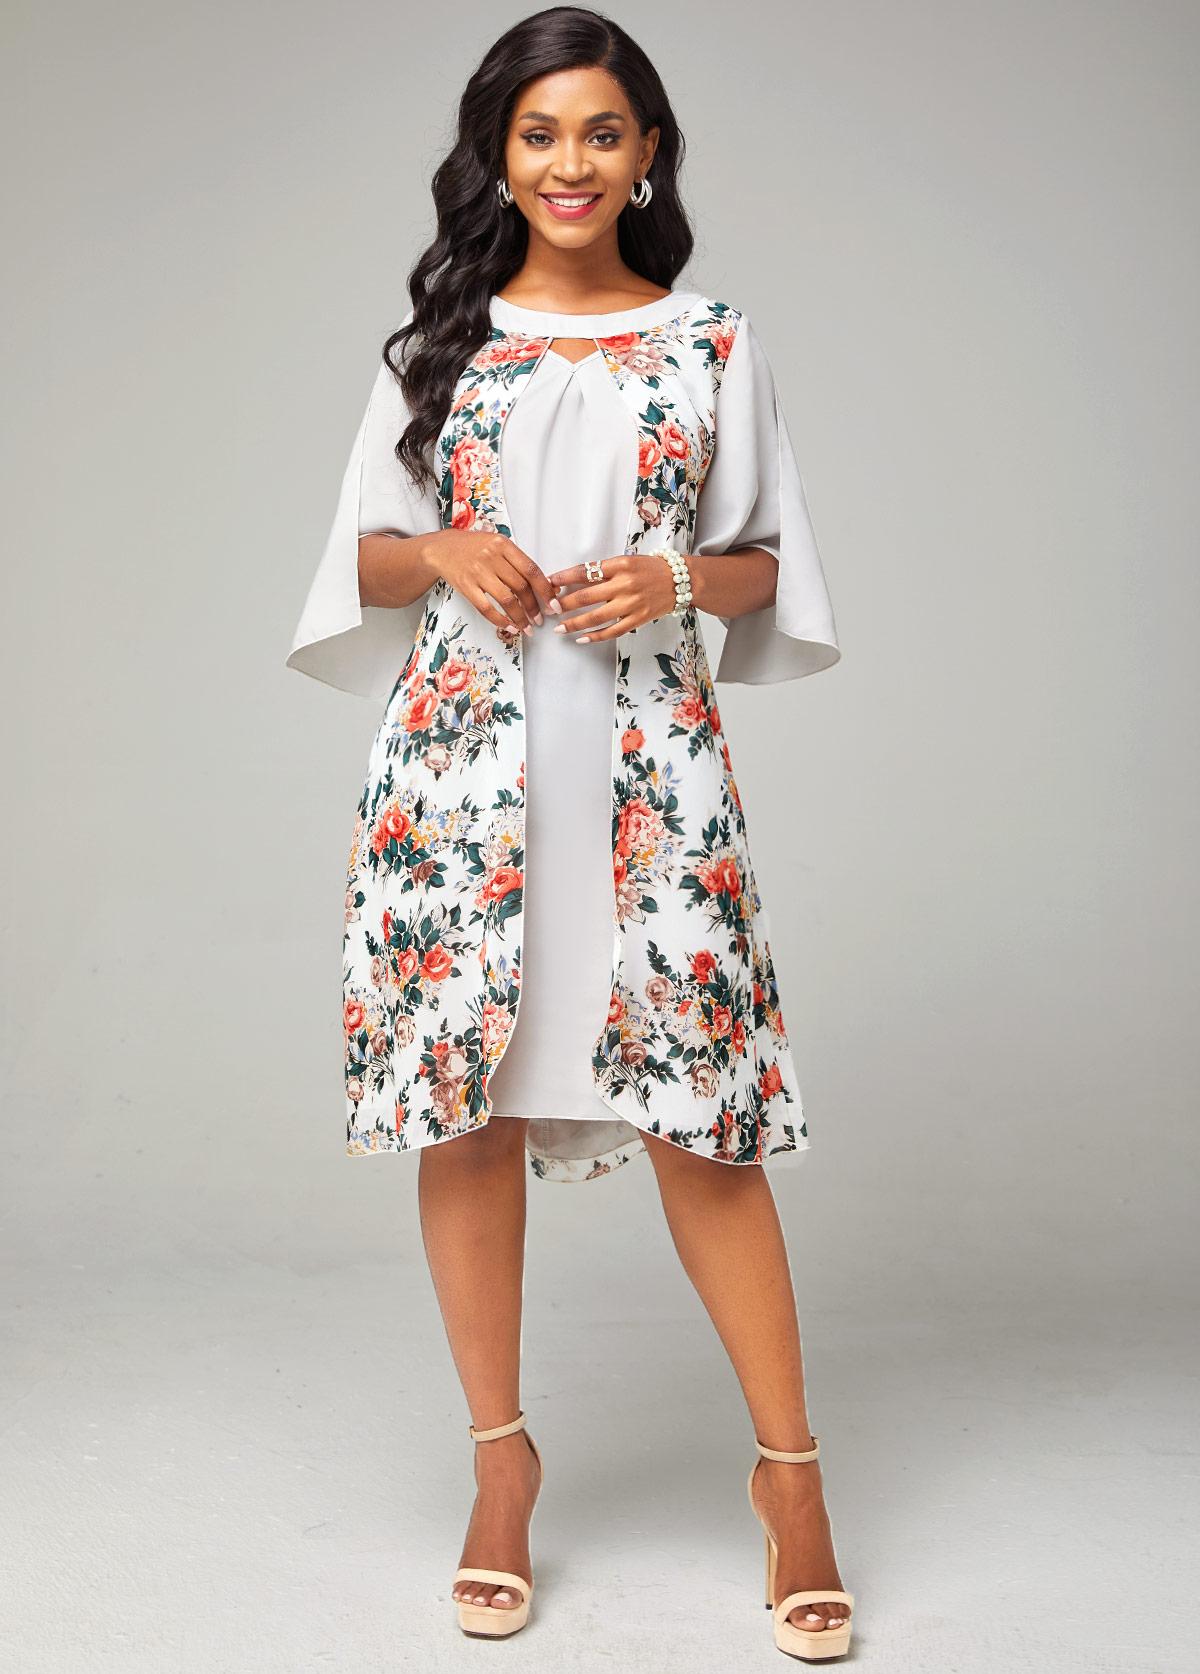 Floral Print Keyhole Neckline Chiffon Dress